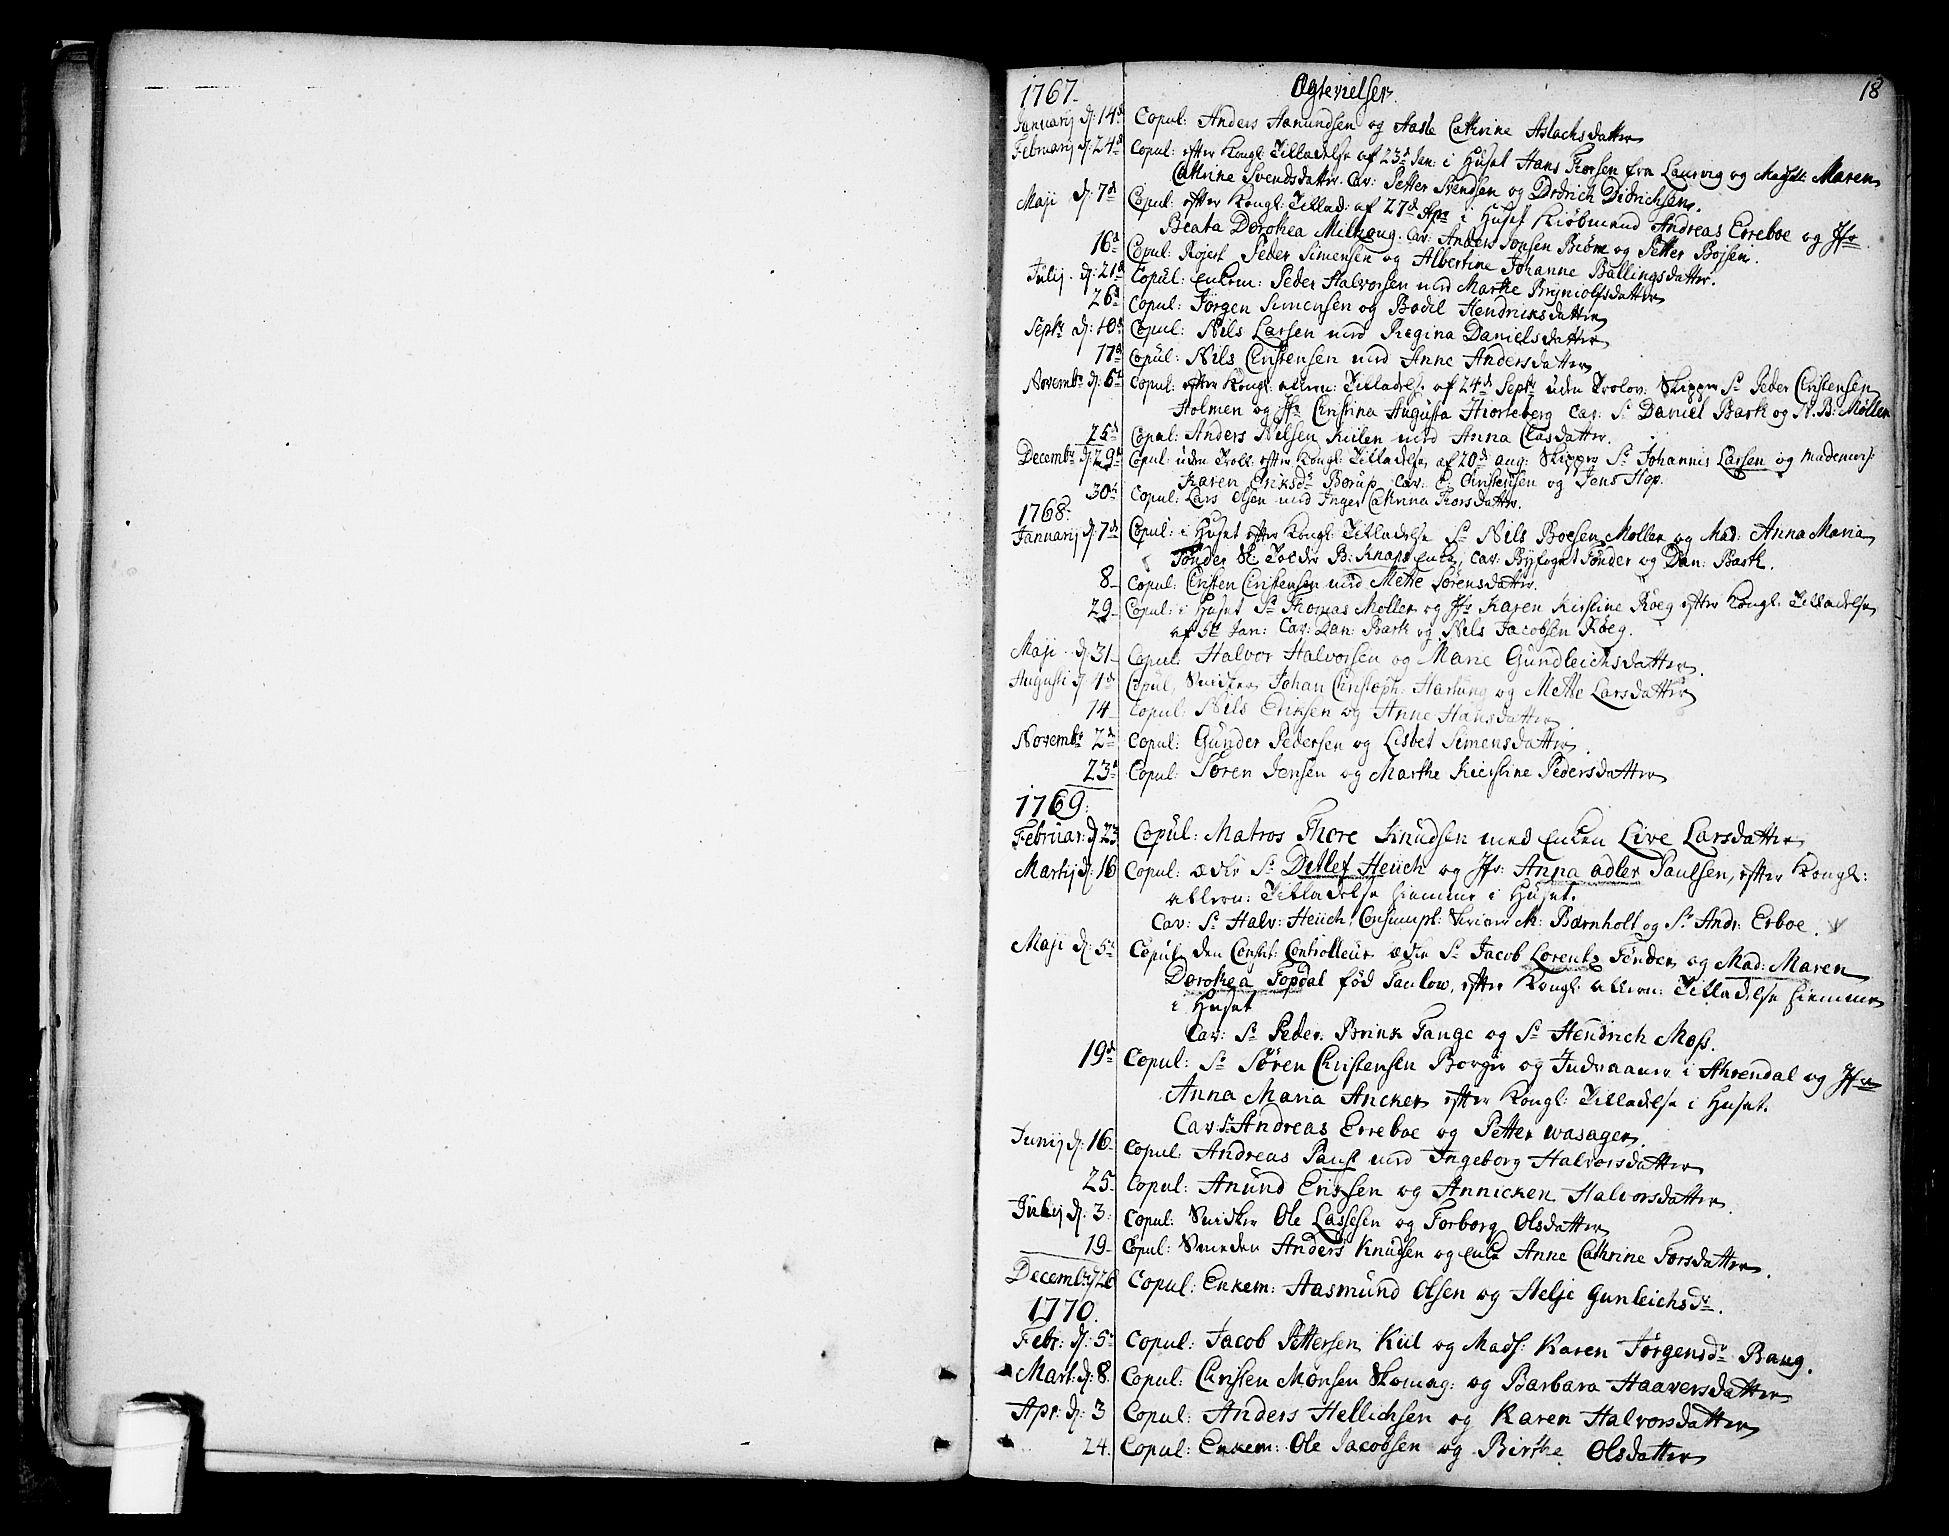 SAKO, Kragerø kirkebøker, F/Fa/L0002: Ministerialbok nr. 2, 1767-1802, s. 18